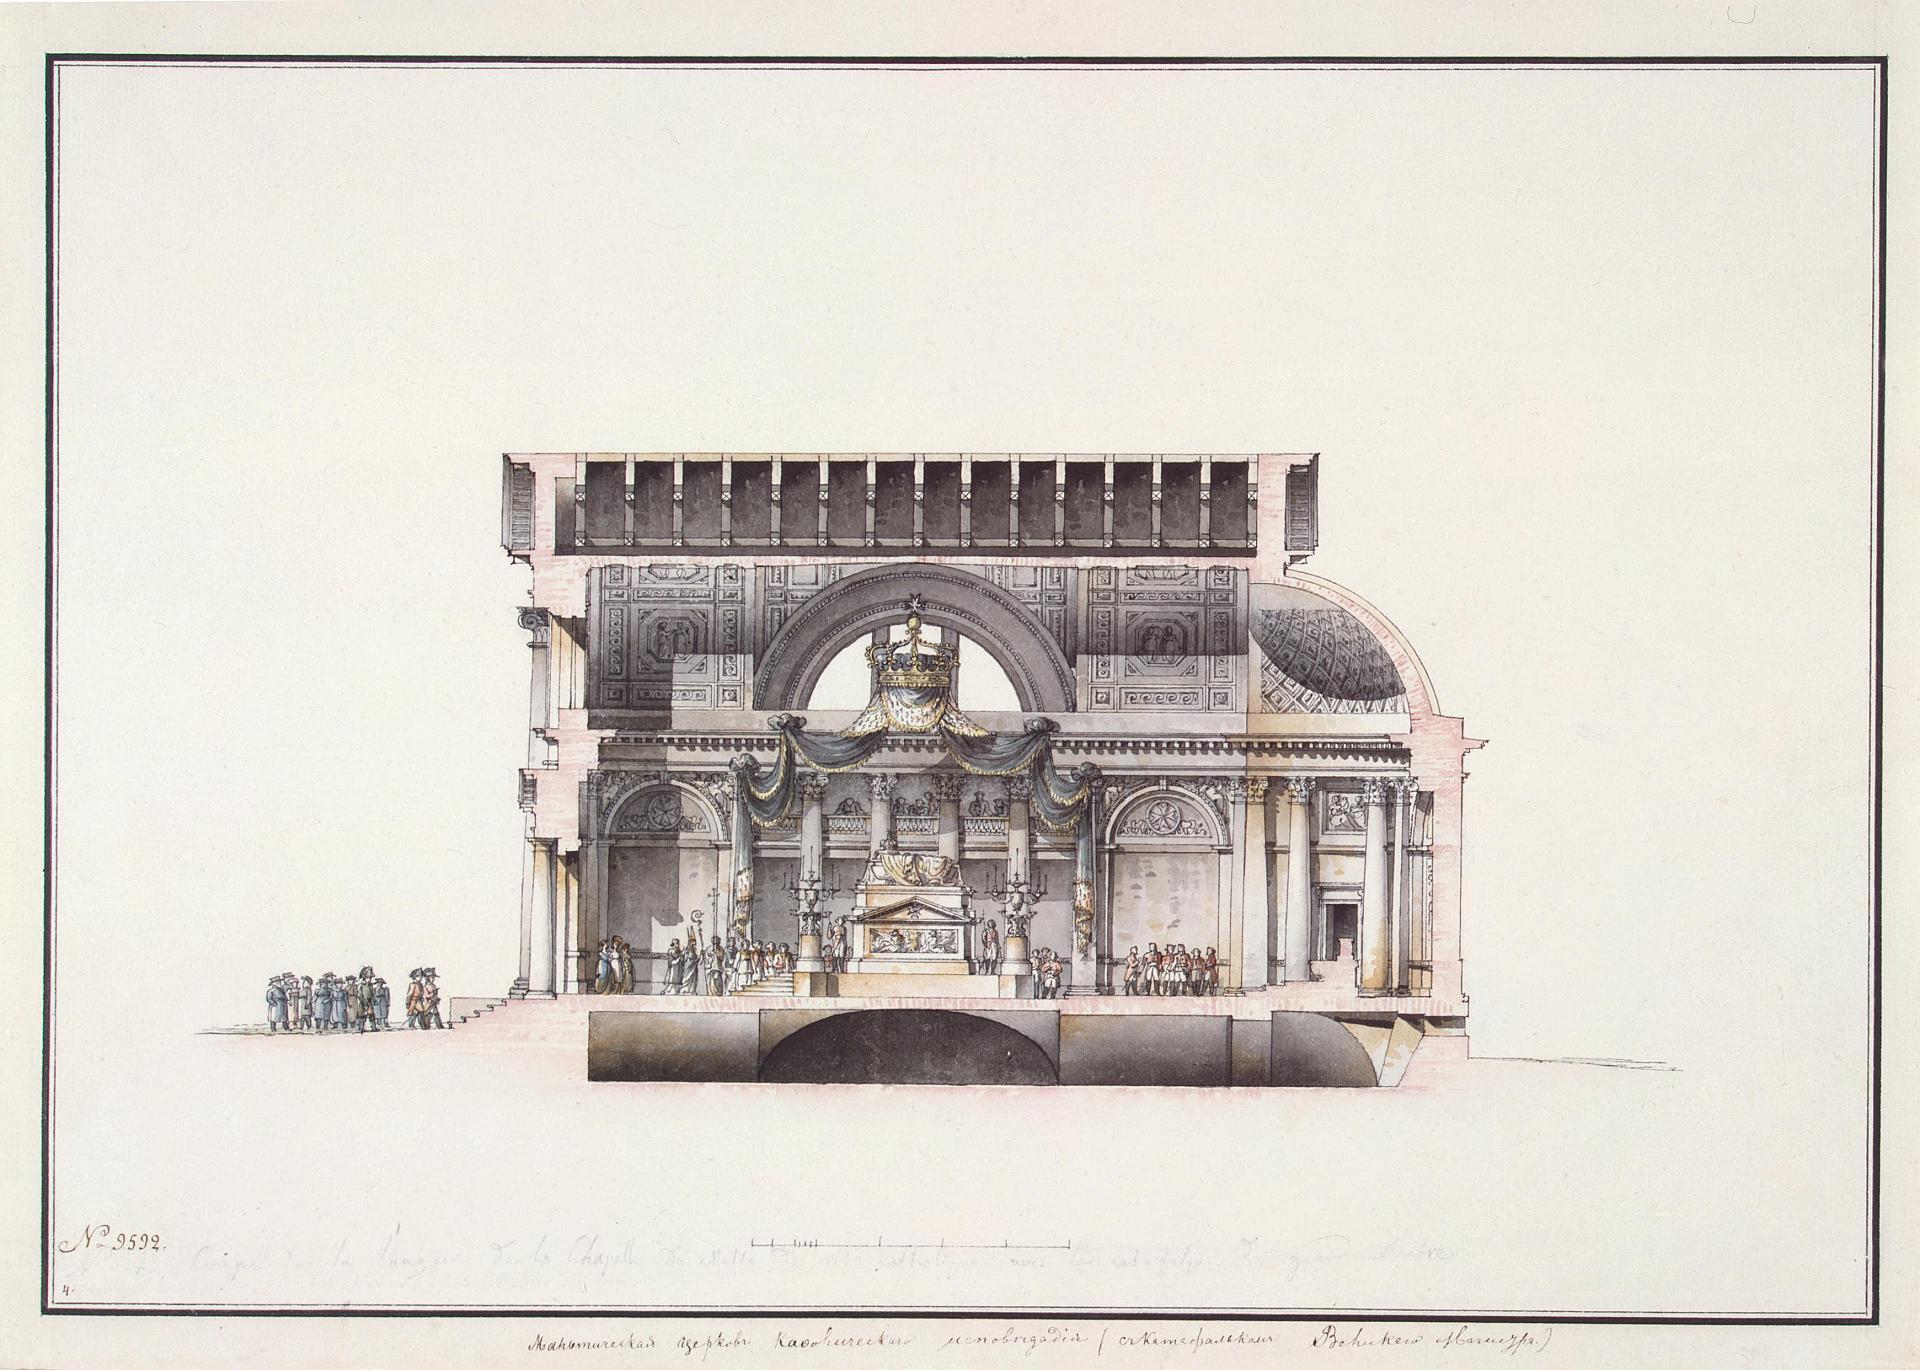 1920x1370 Filemalta Chapel Drawing.jpg